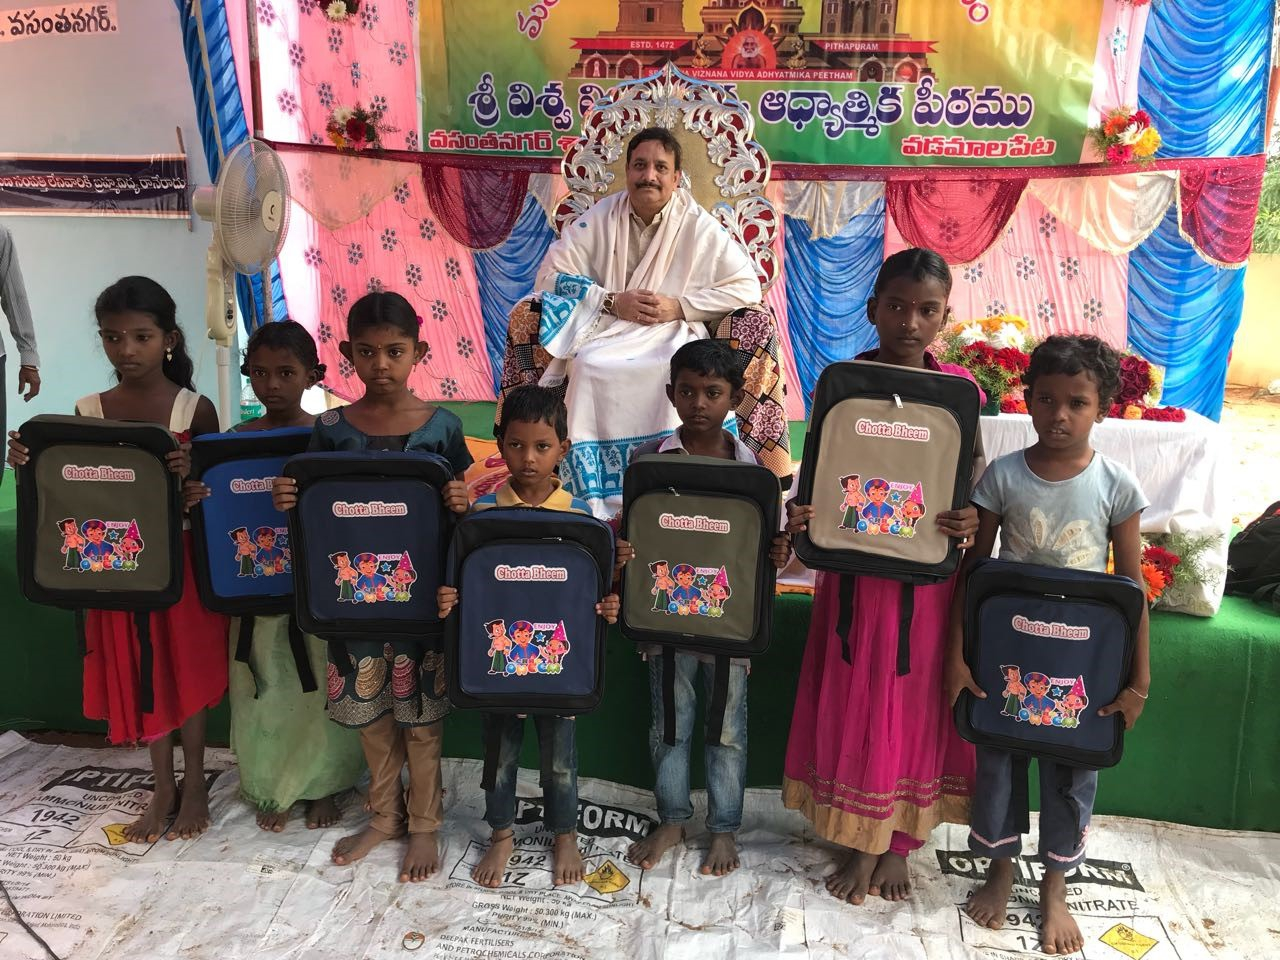 Blankets and Schoolbags Distribution by Dr Umar Alisha at RamarajuKandrika, Vadamalapeta Mandal, Chittoor